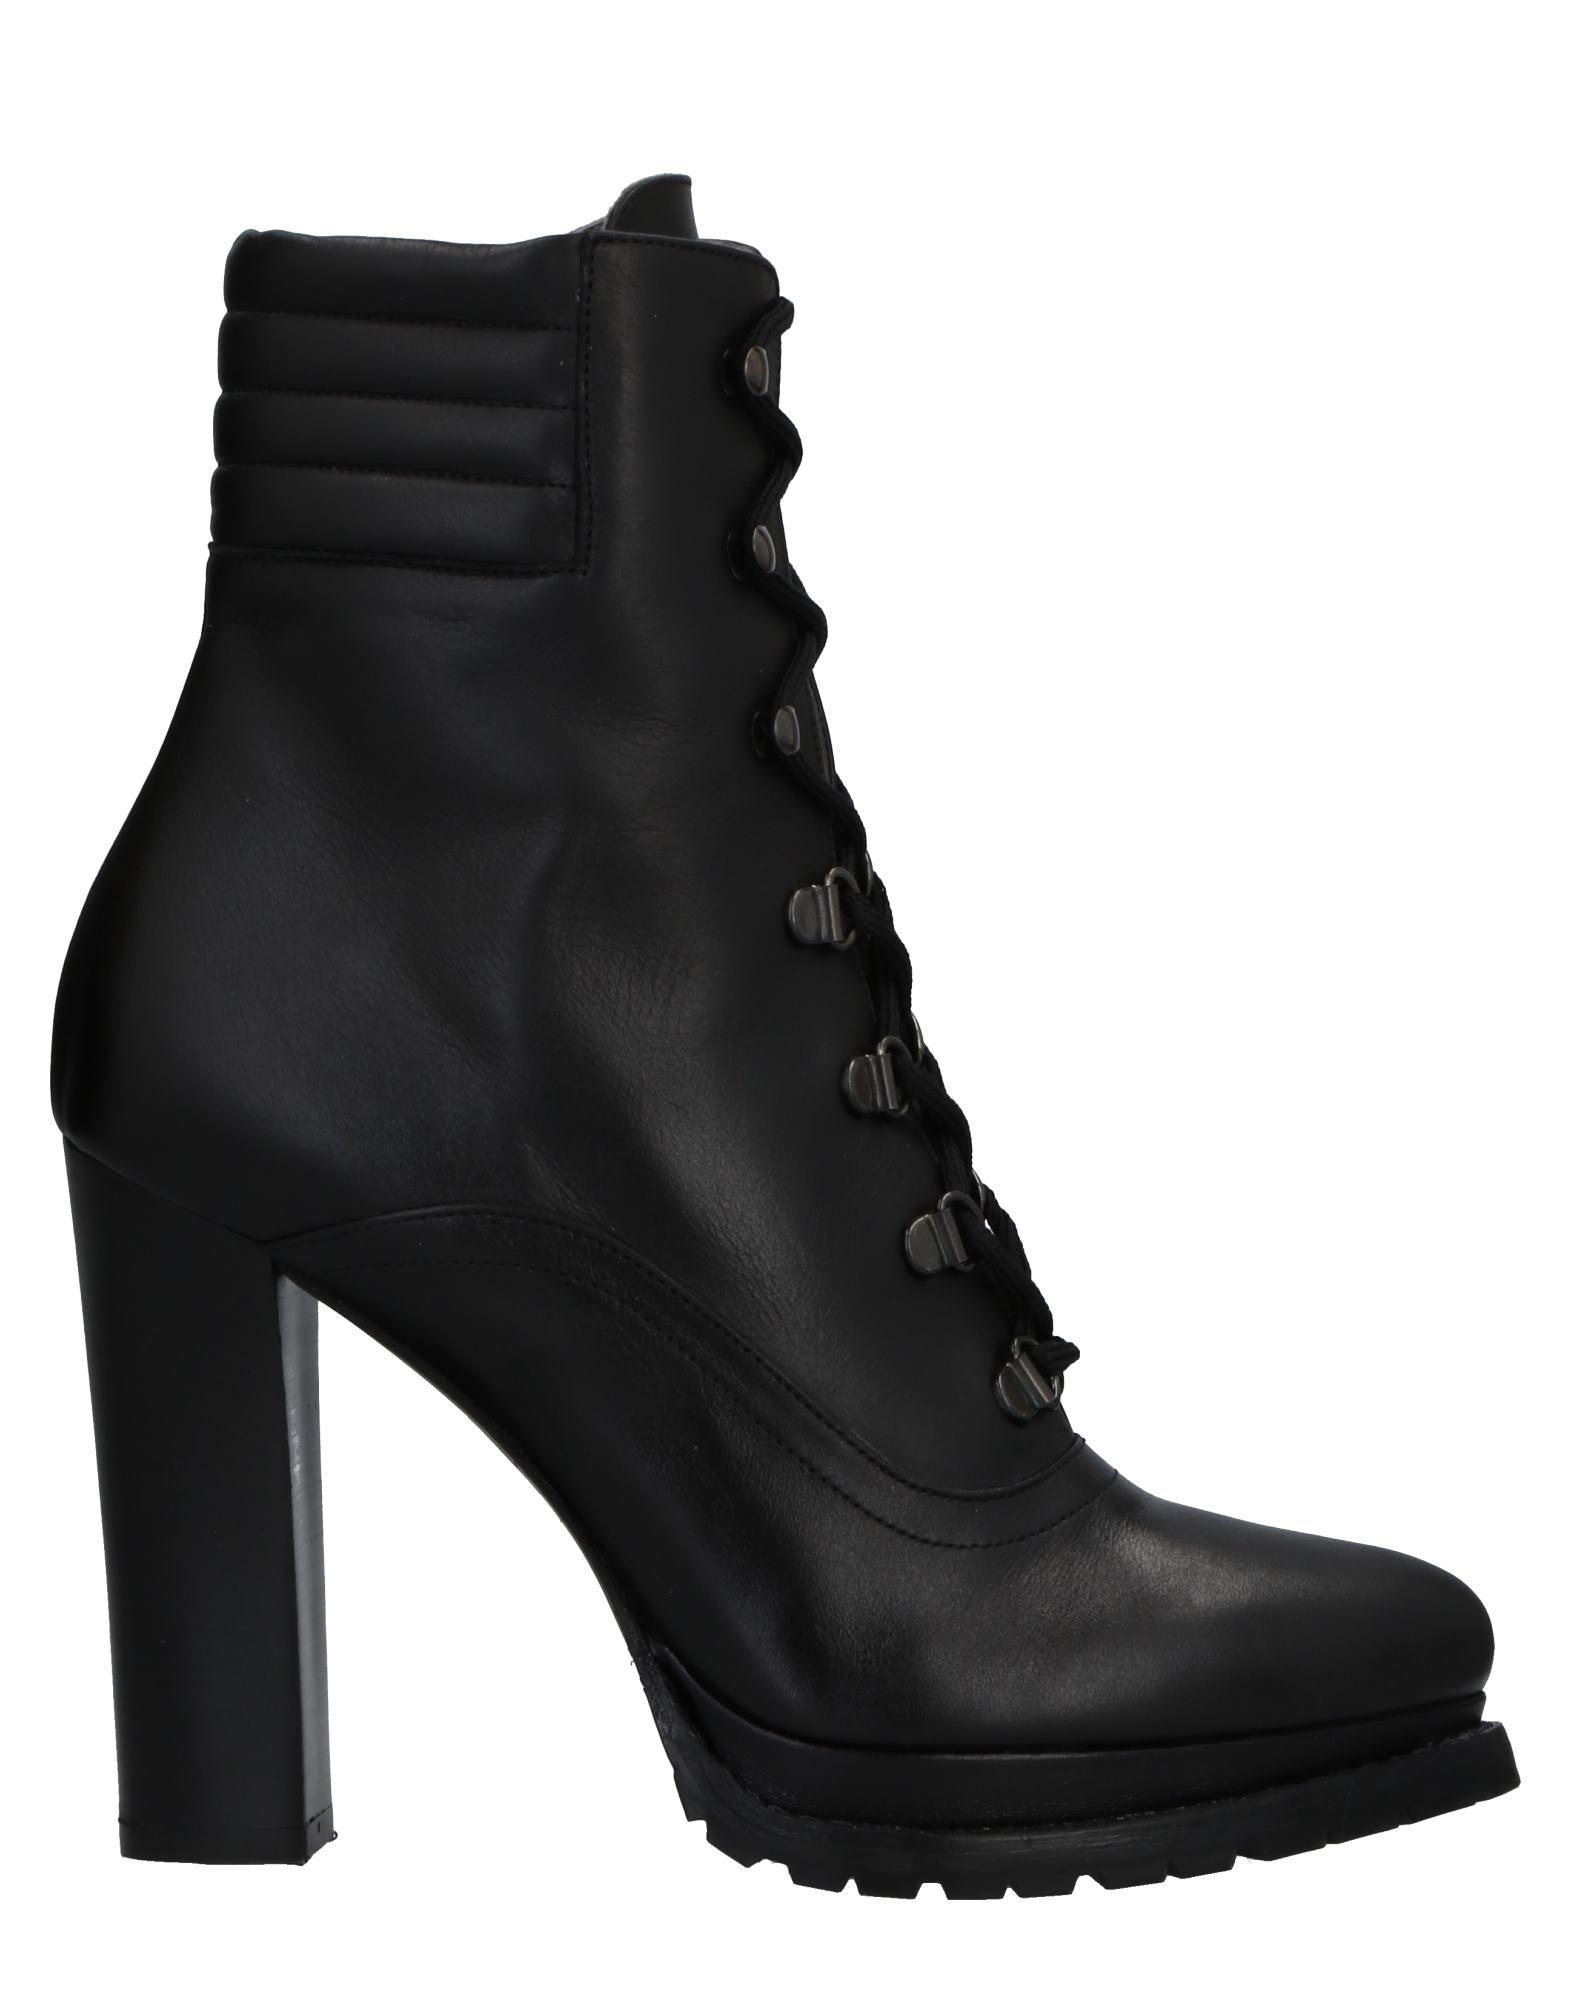 Icône Icône Ankle Boot - Women Icône Icône Ankle Boots online on  Australia - 11521433IG 33f6b2